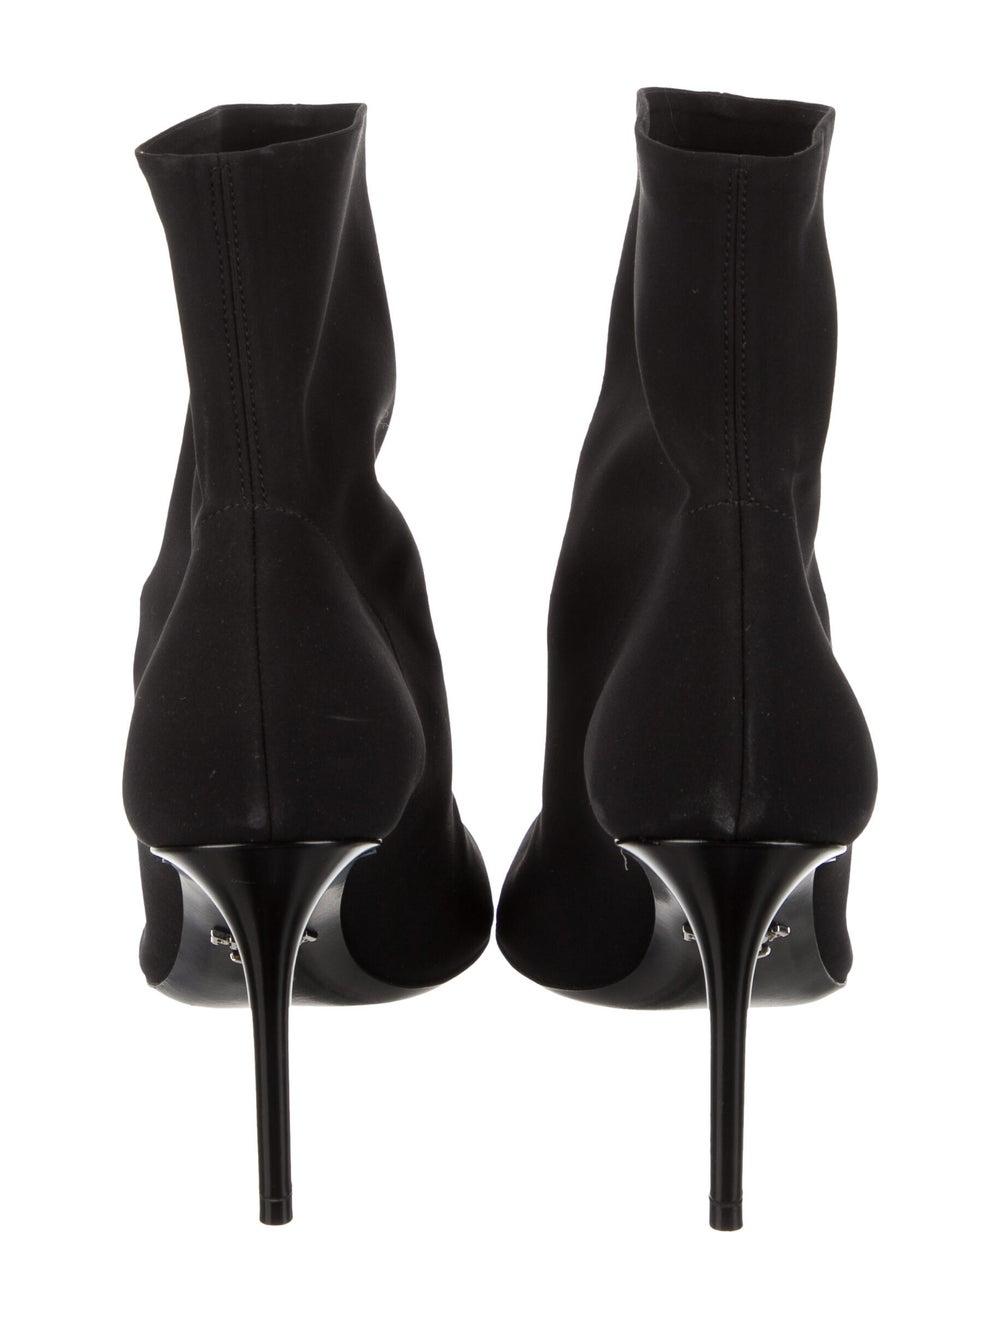 Prada Sock Boots Black - image 4